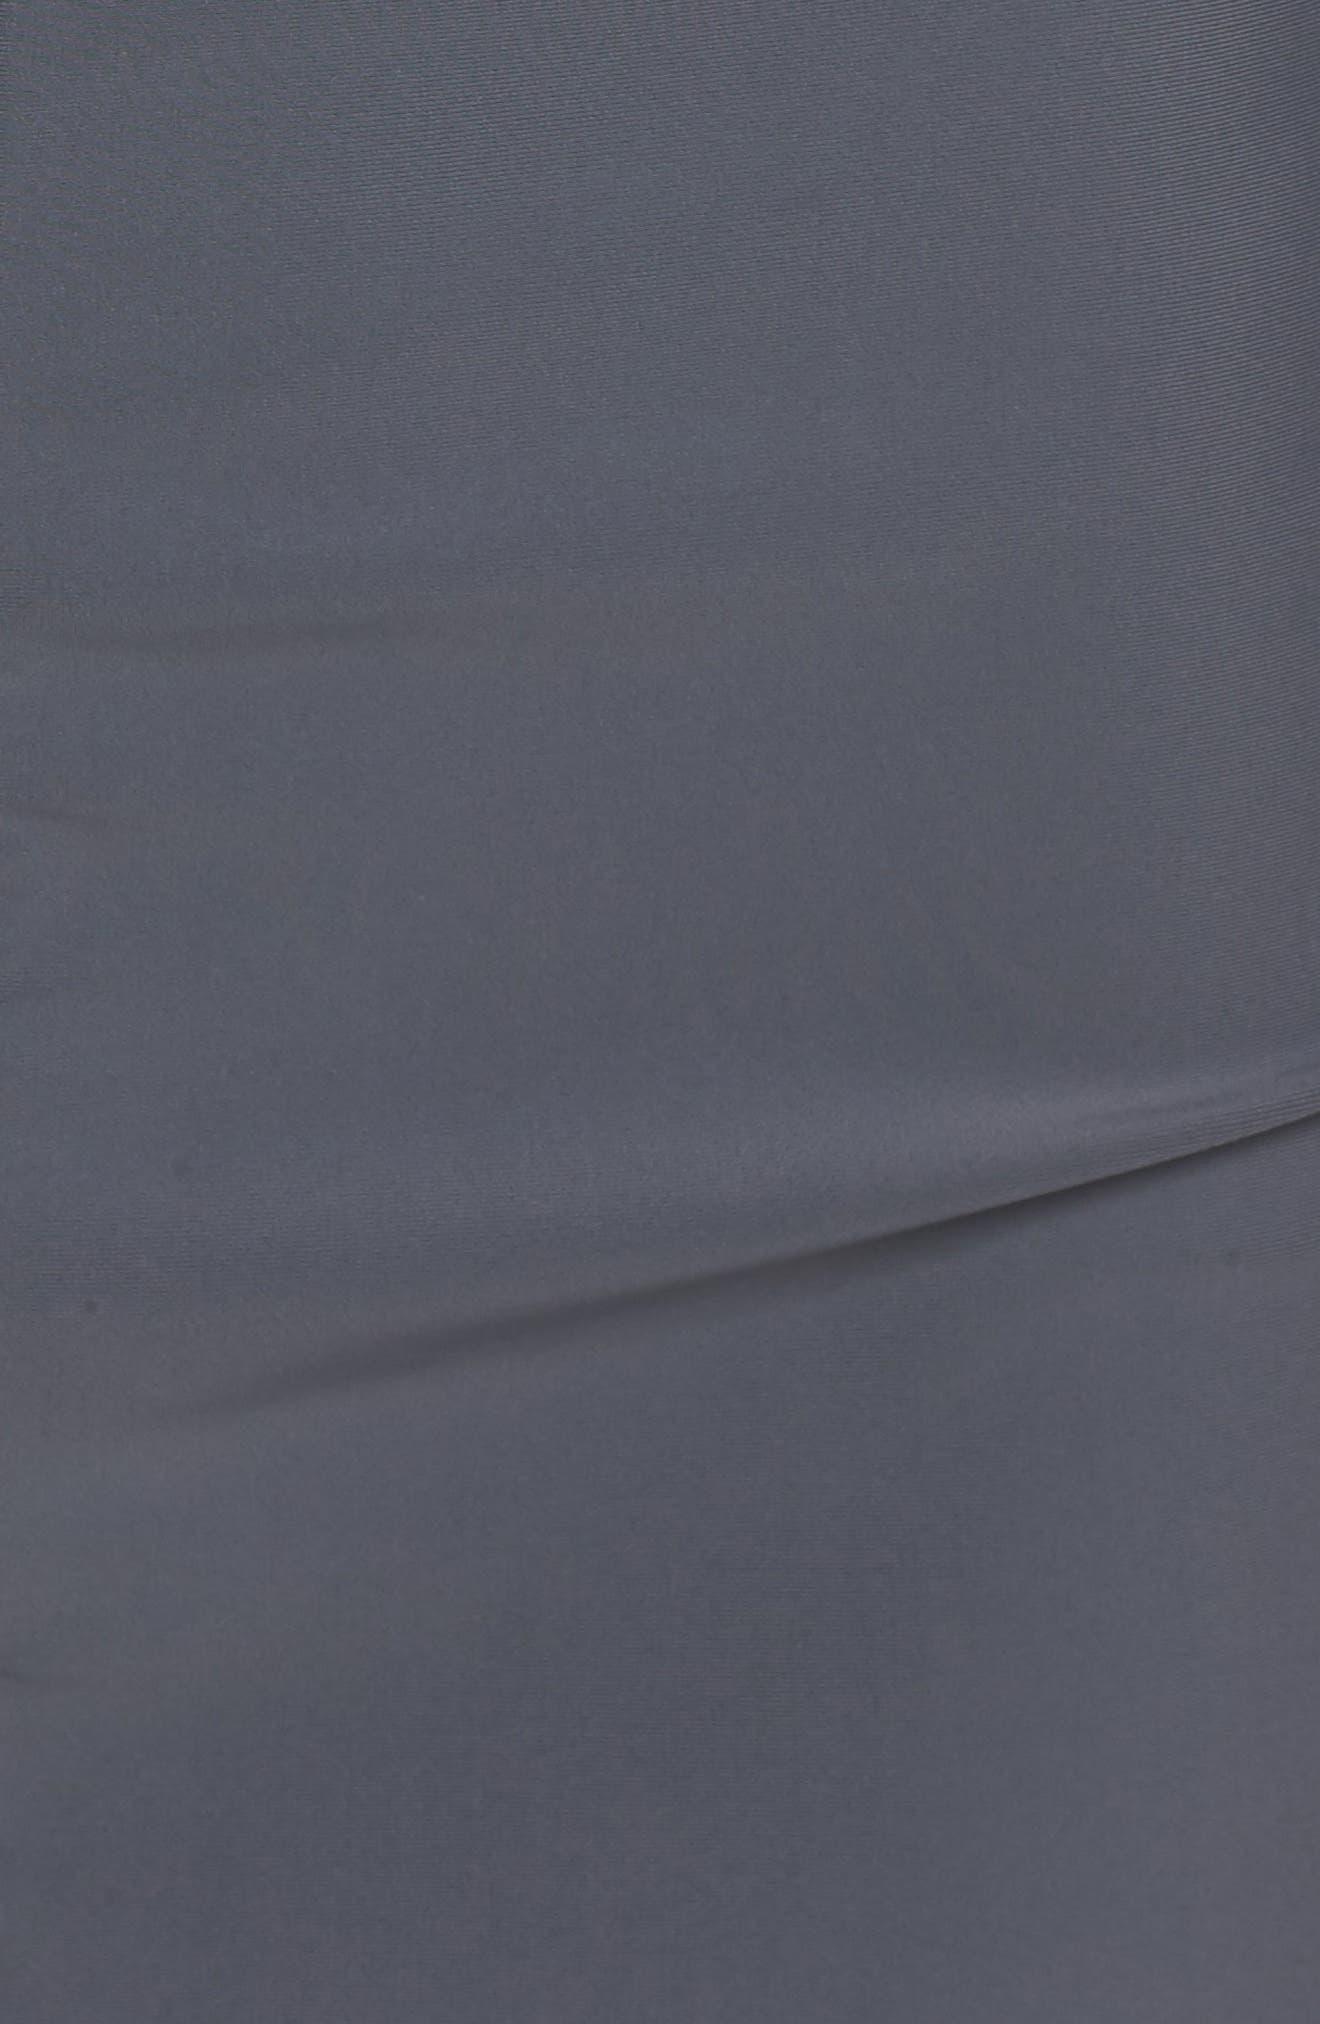 Zip Cover-Up Swim Dress,                             Alternate thumbnail 5, color,                             Grey